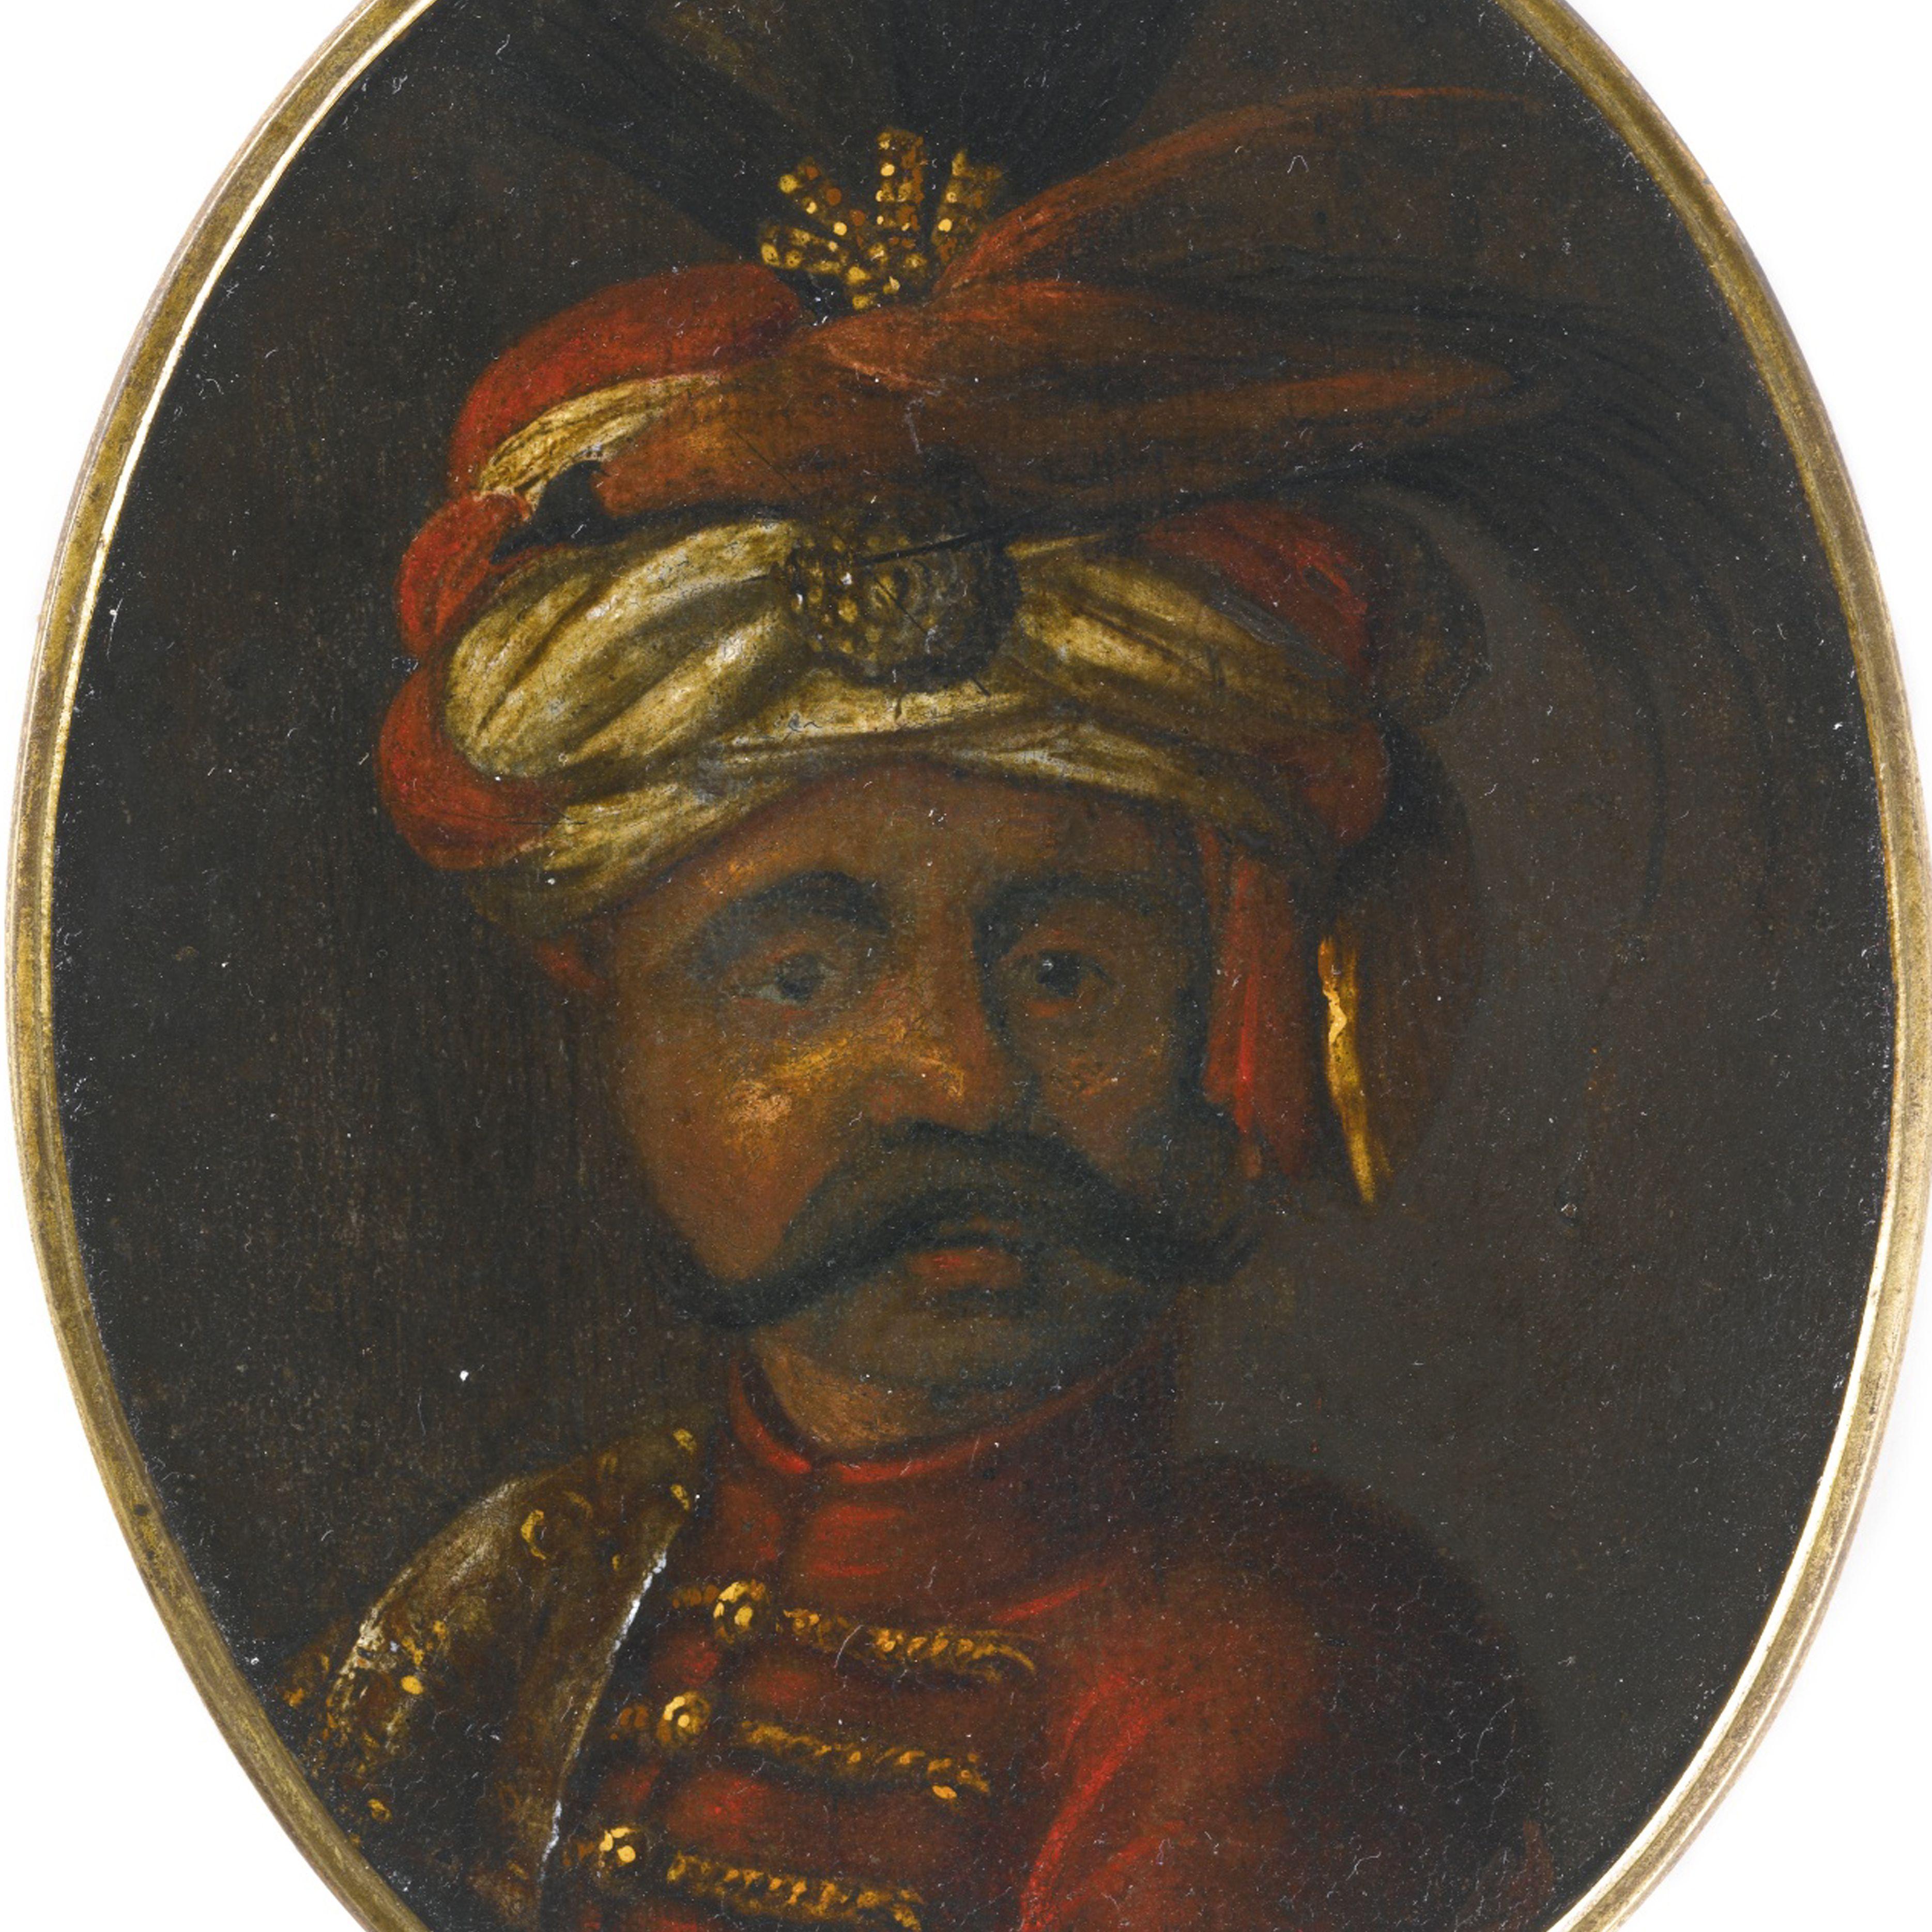 Suleiman II (1642-1691), Sultan of the Ottoman Empire. Artist: Anonymous